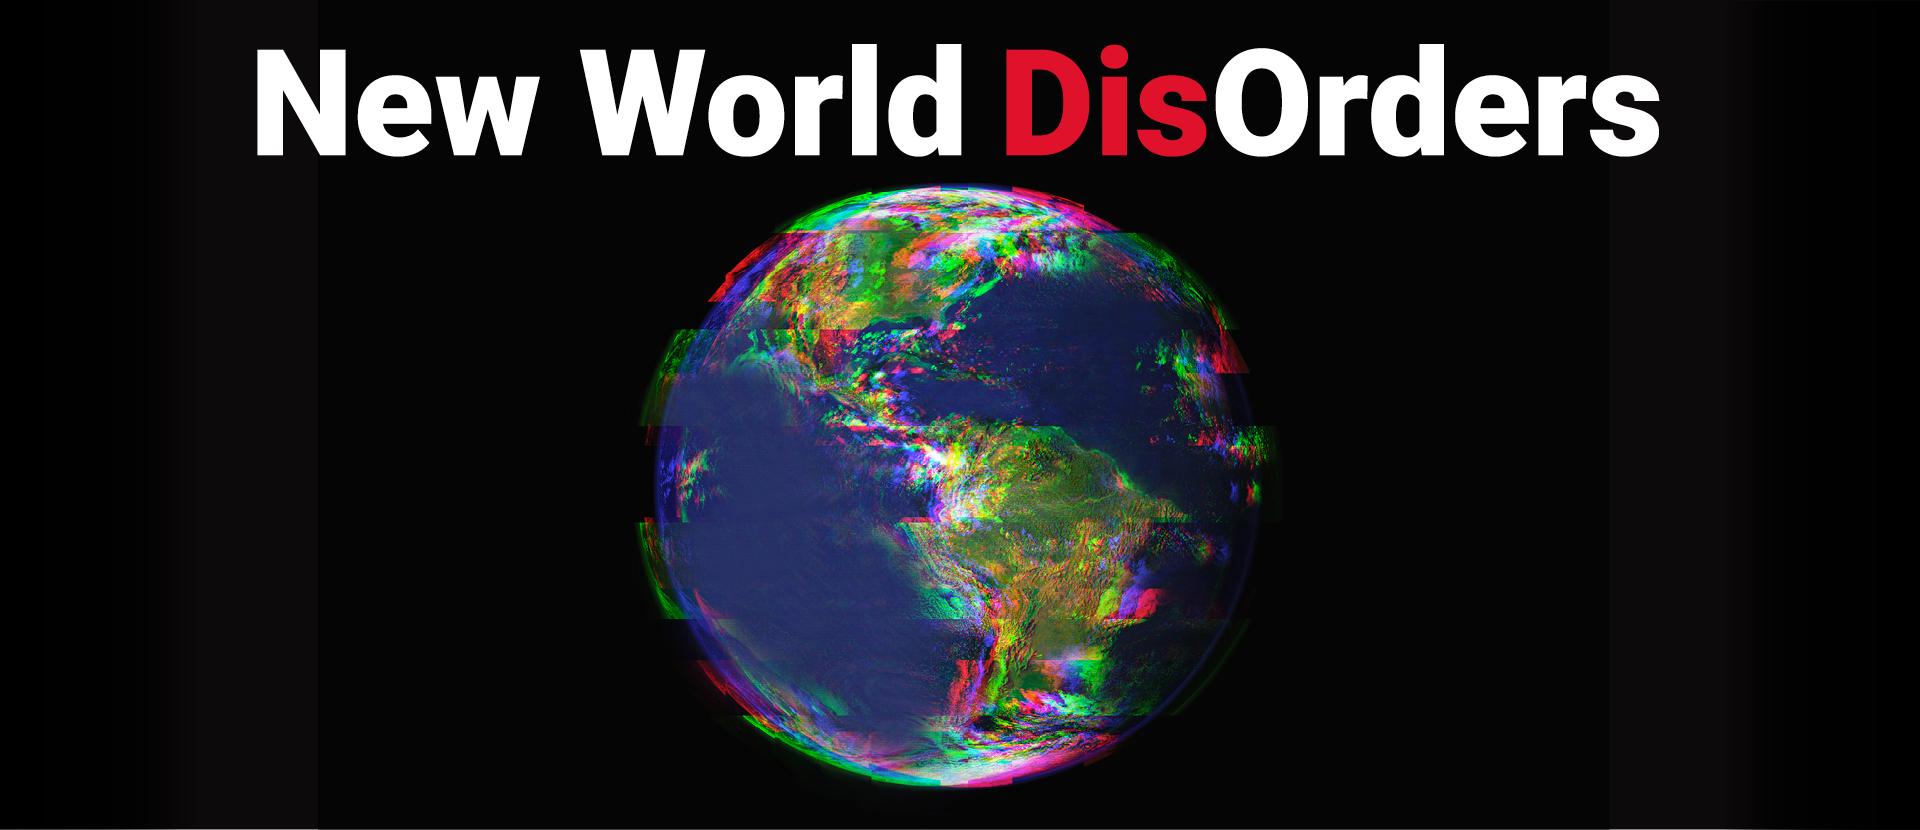 18-0772-lse-festival-disorder-web-assets-1920×8302